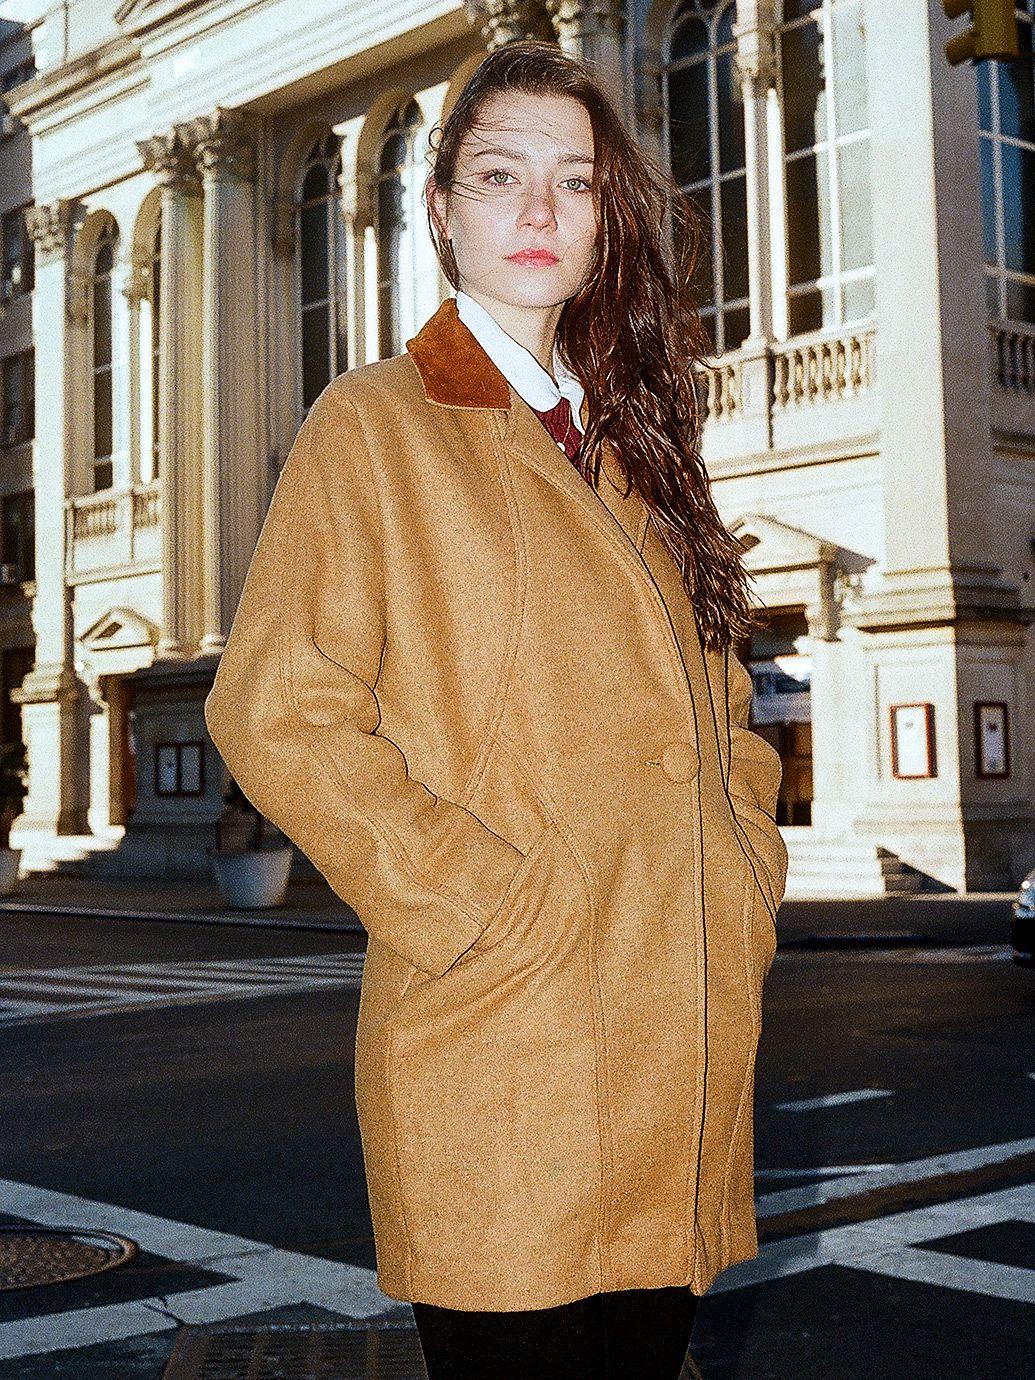 Petite Unisex Long Wool Coat | American Apparel | wishlist ...